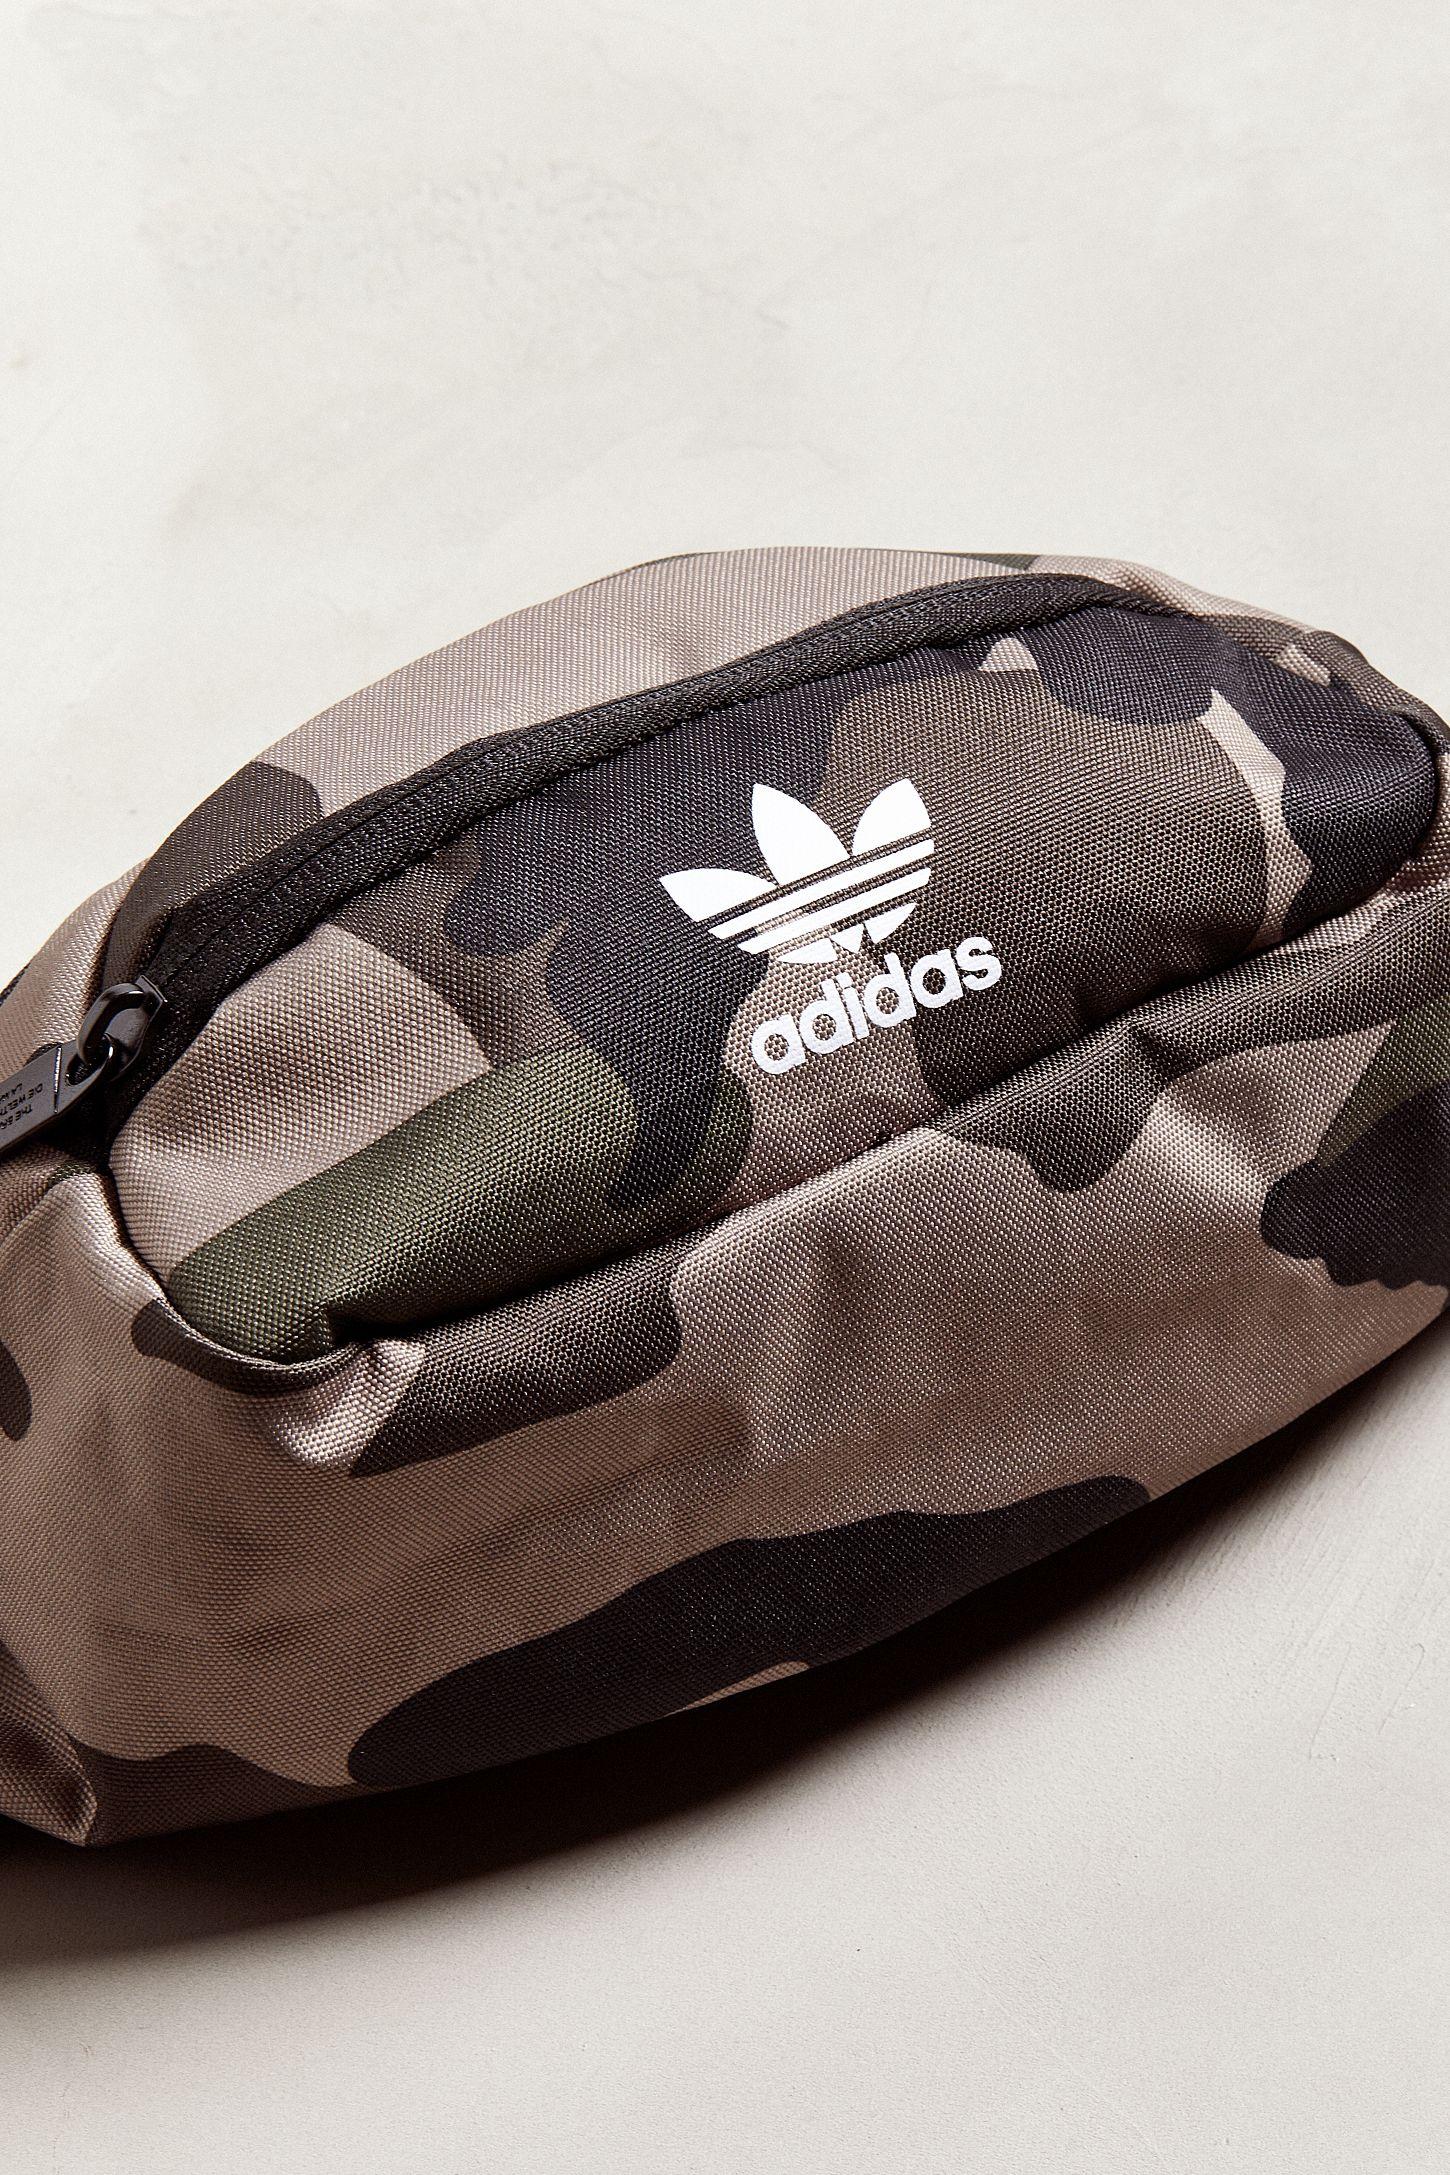 bdfb8c6c151 adidas Originals National Sling Bag | Urban Outfitters